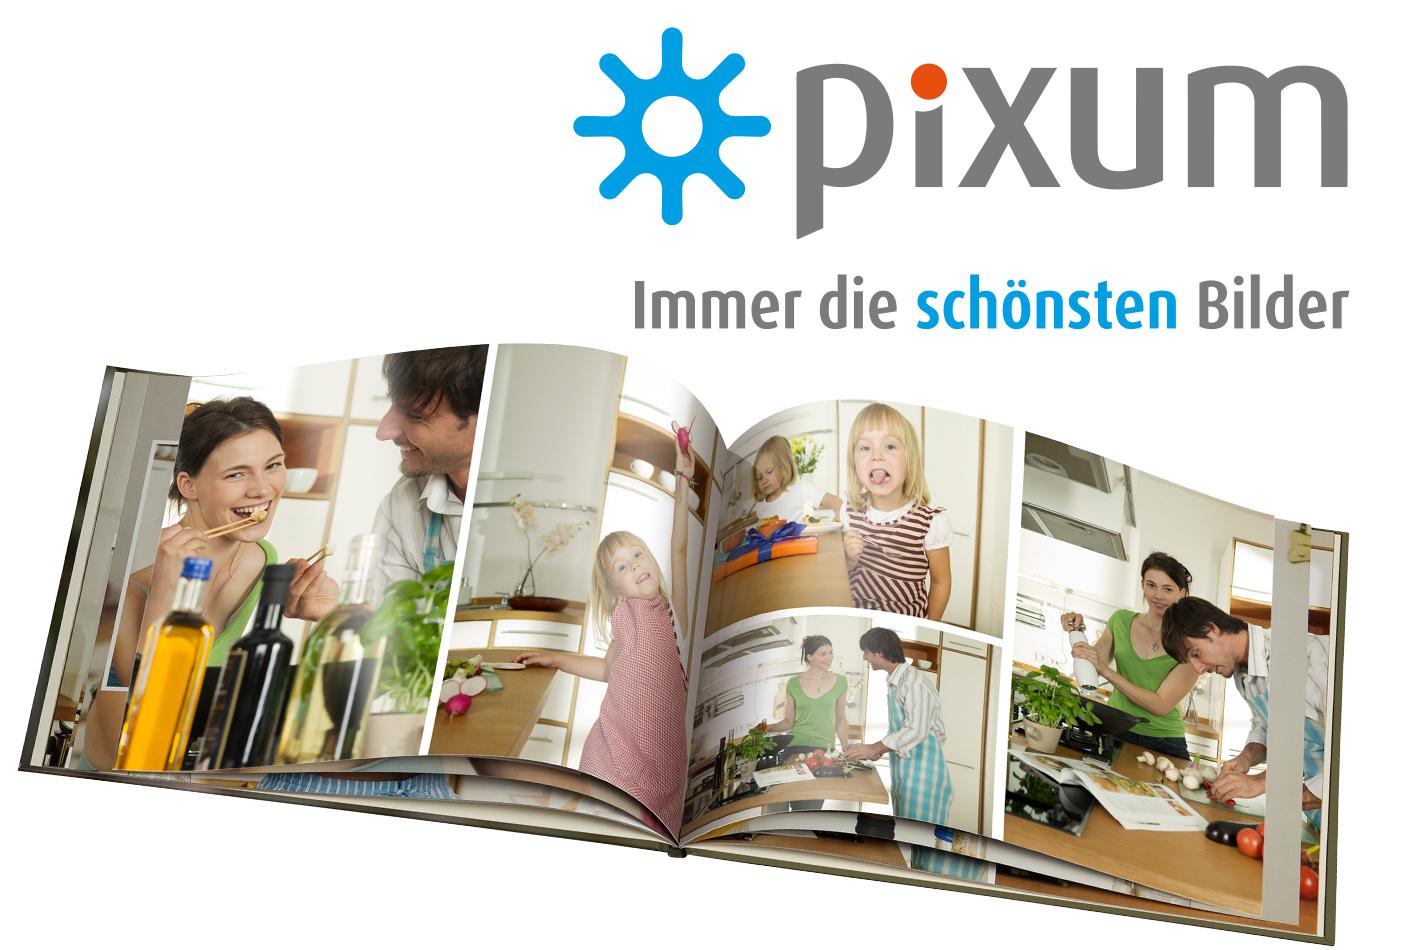 10€ GS für pixum Fotobuch erhalten @ nippolino.de